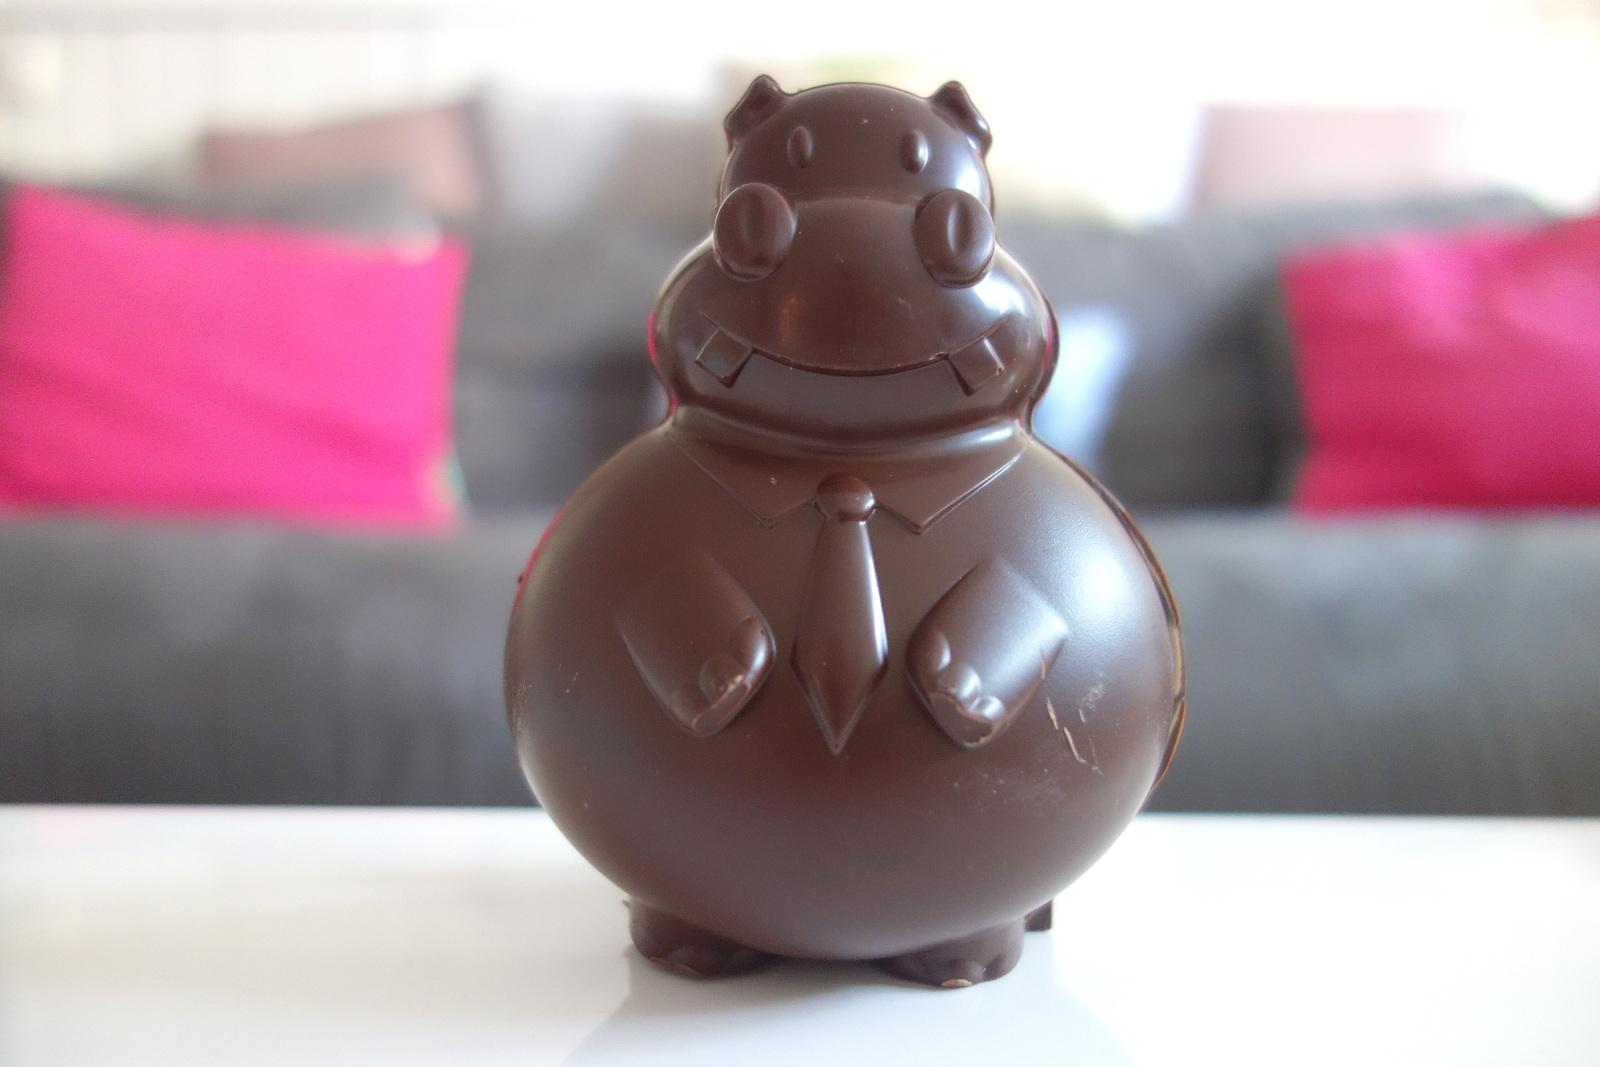 Hippopotamus nouvelle carte 2017 - chocolat